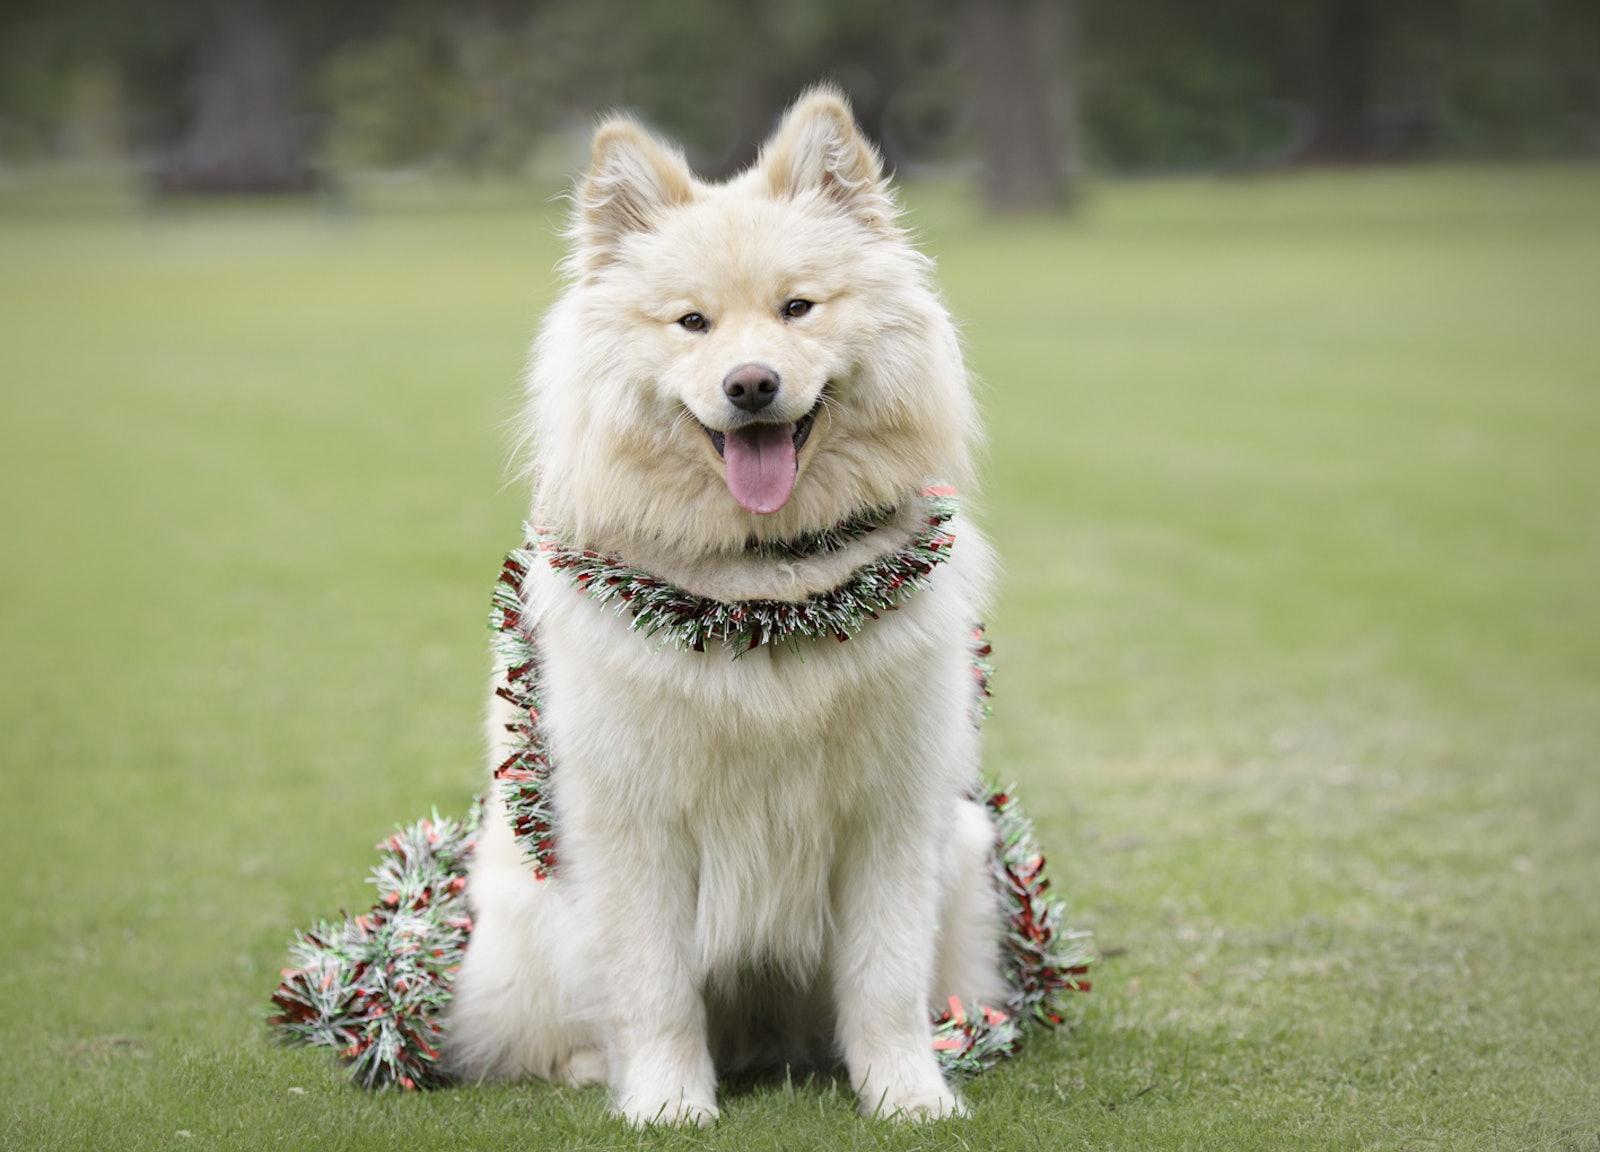 Wag-3 - Dog Photography